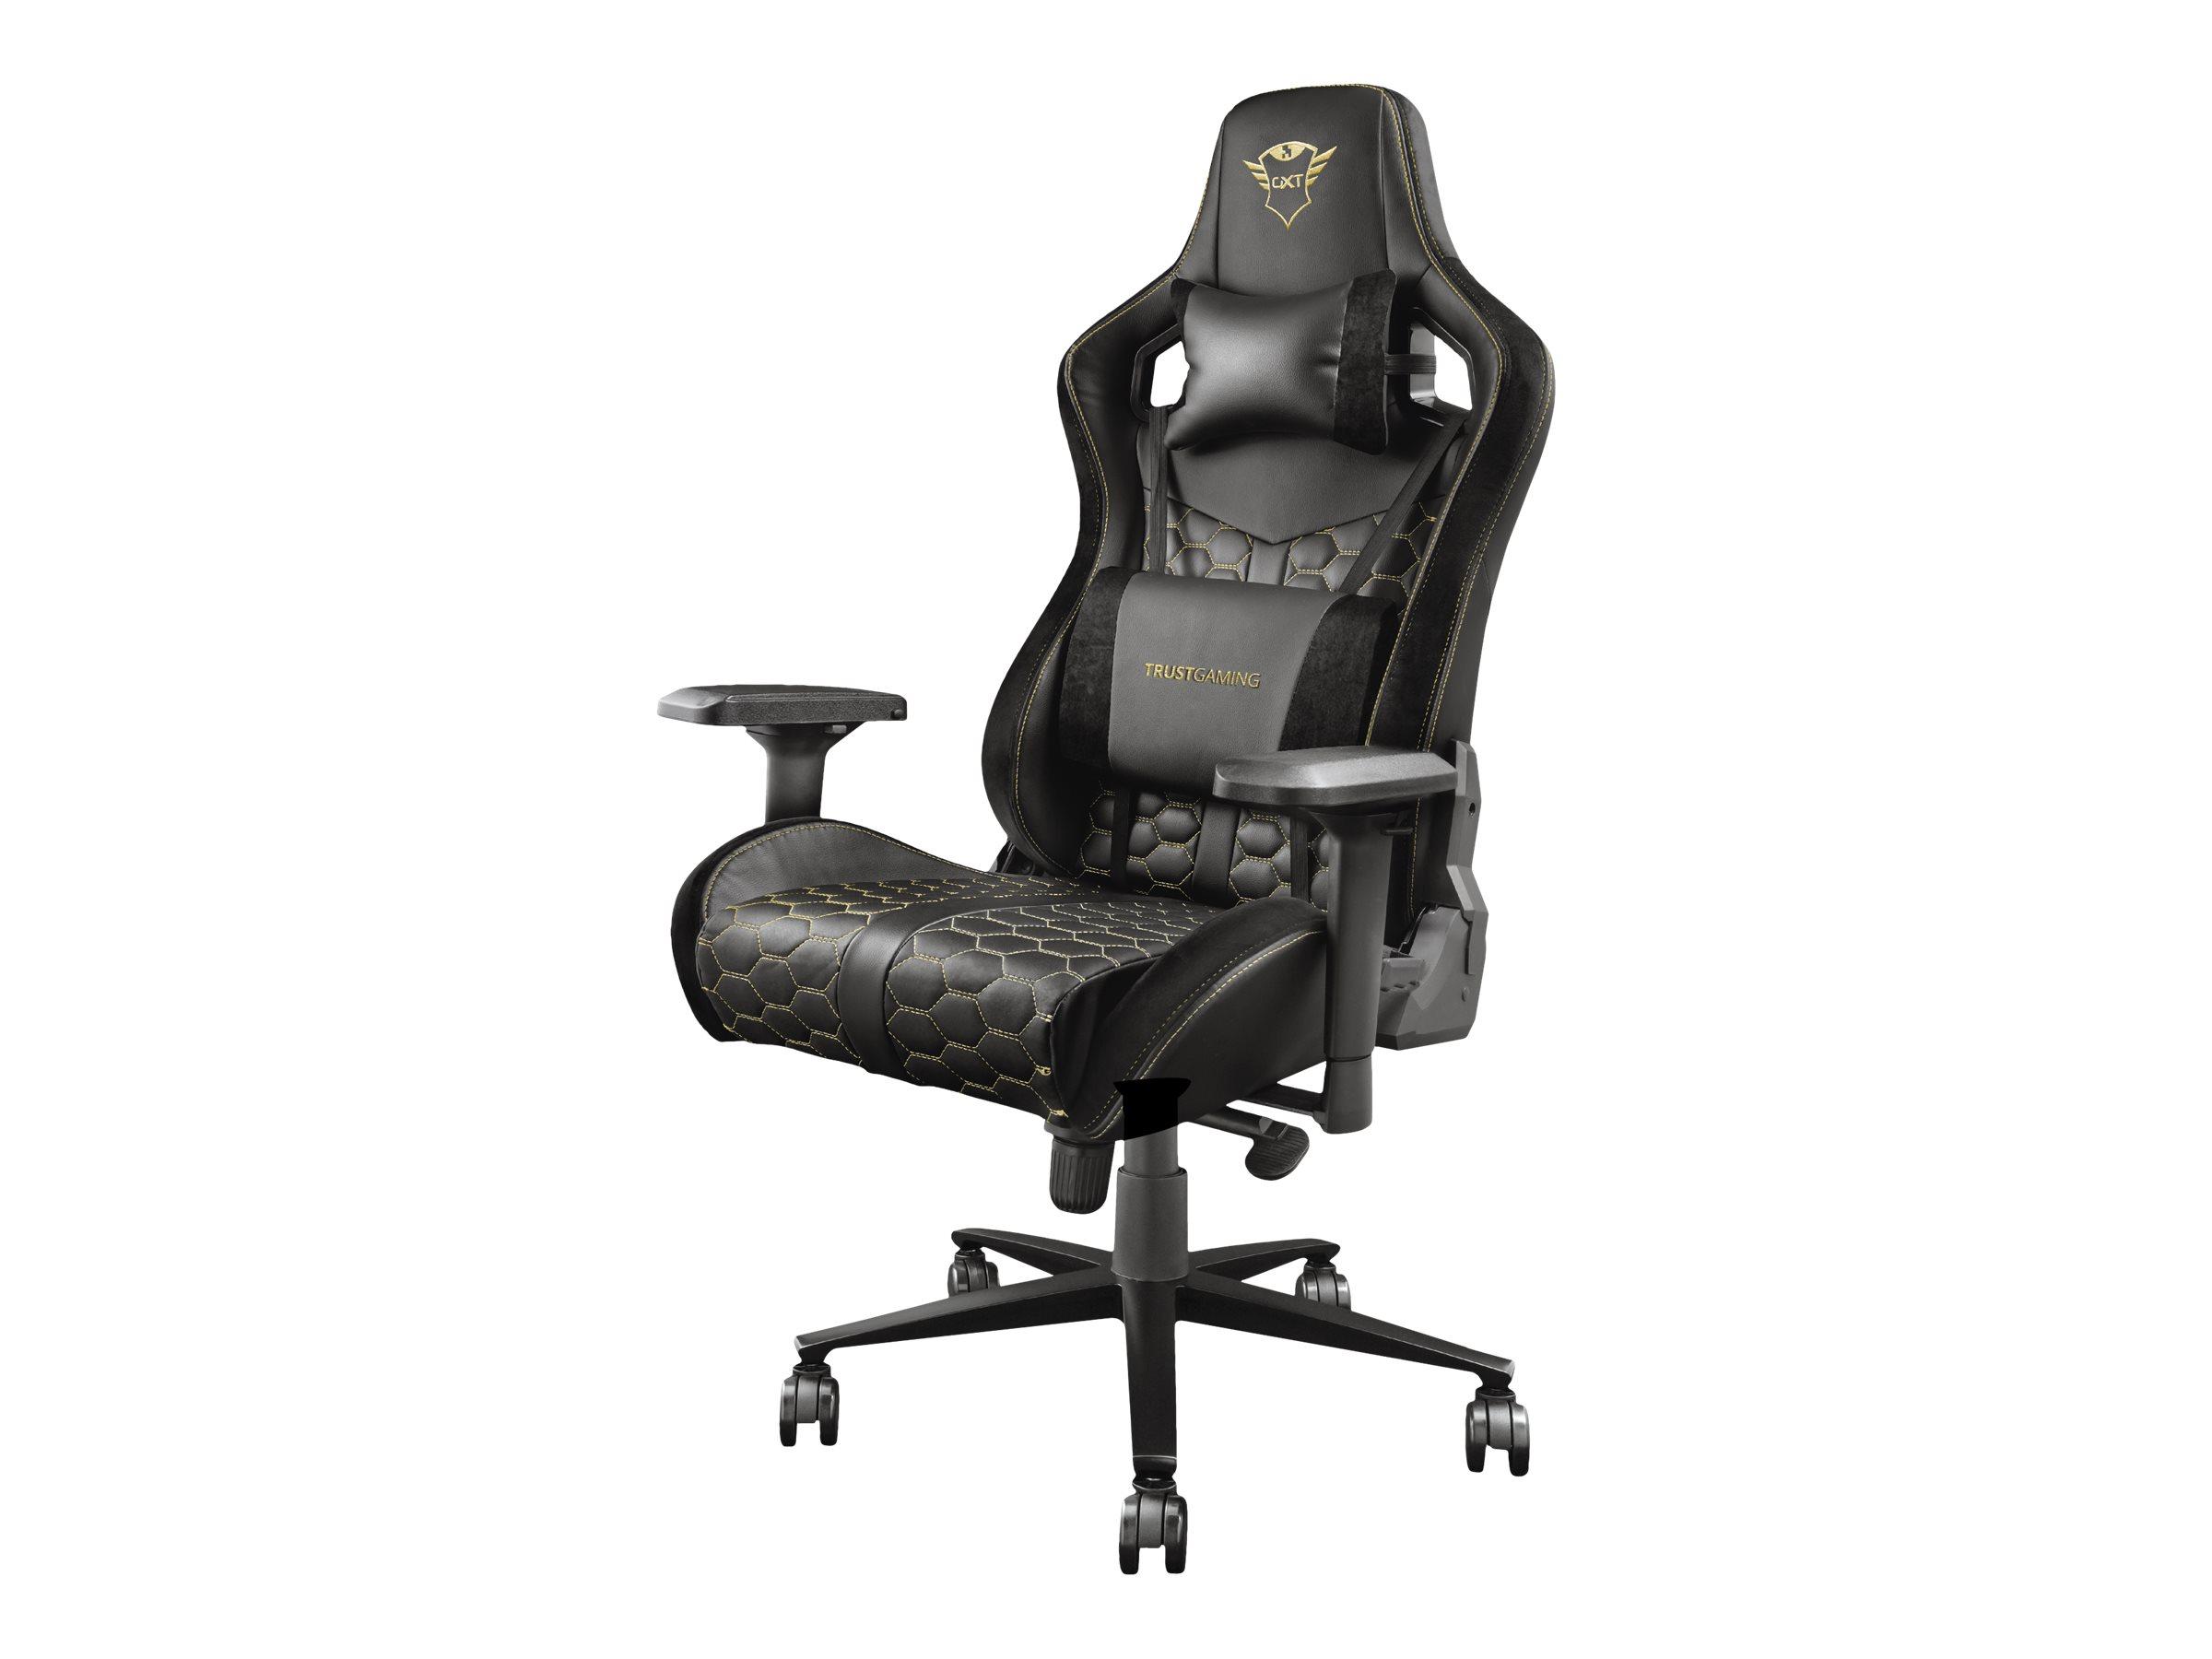 Trust Gaming GXT 712 Resto Pro - Stuhl - ergonomisch - Armlehnen - Neigen - Drehgelenk